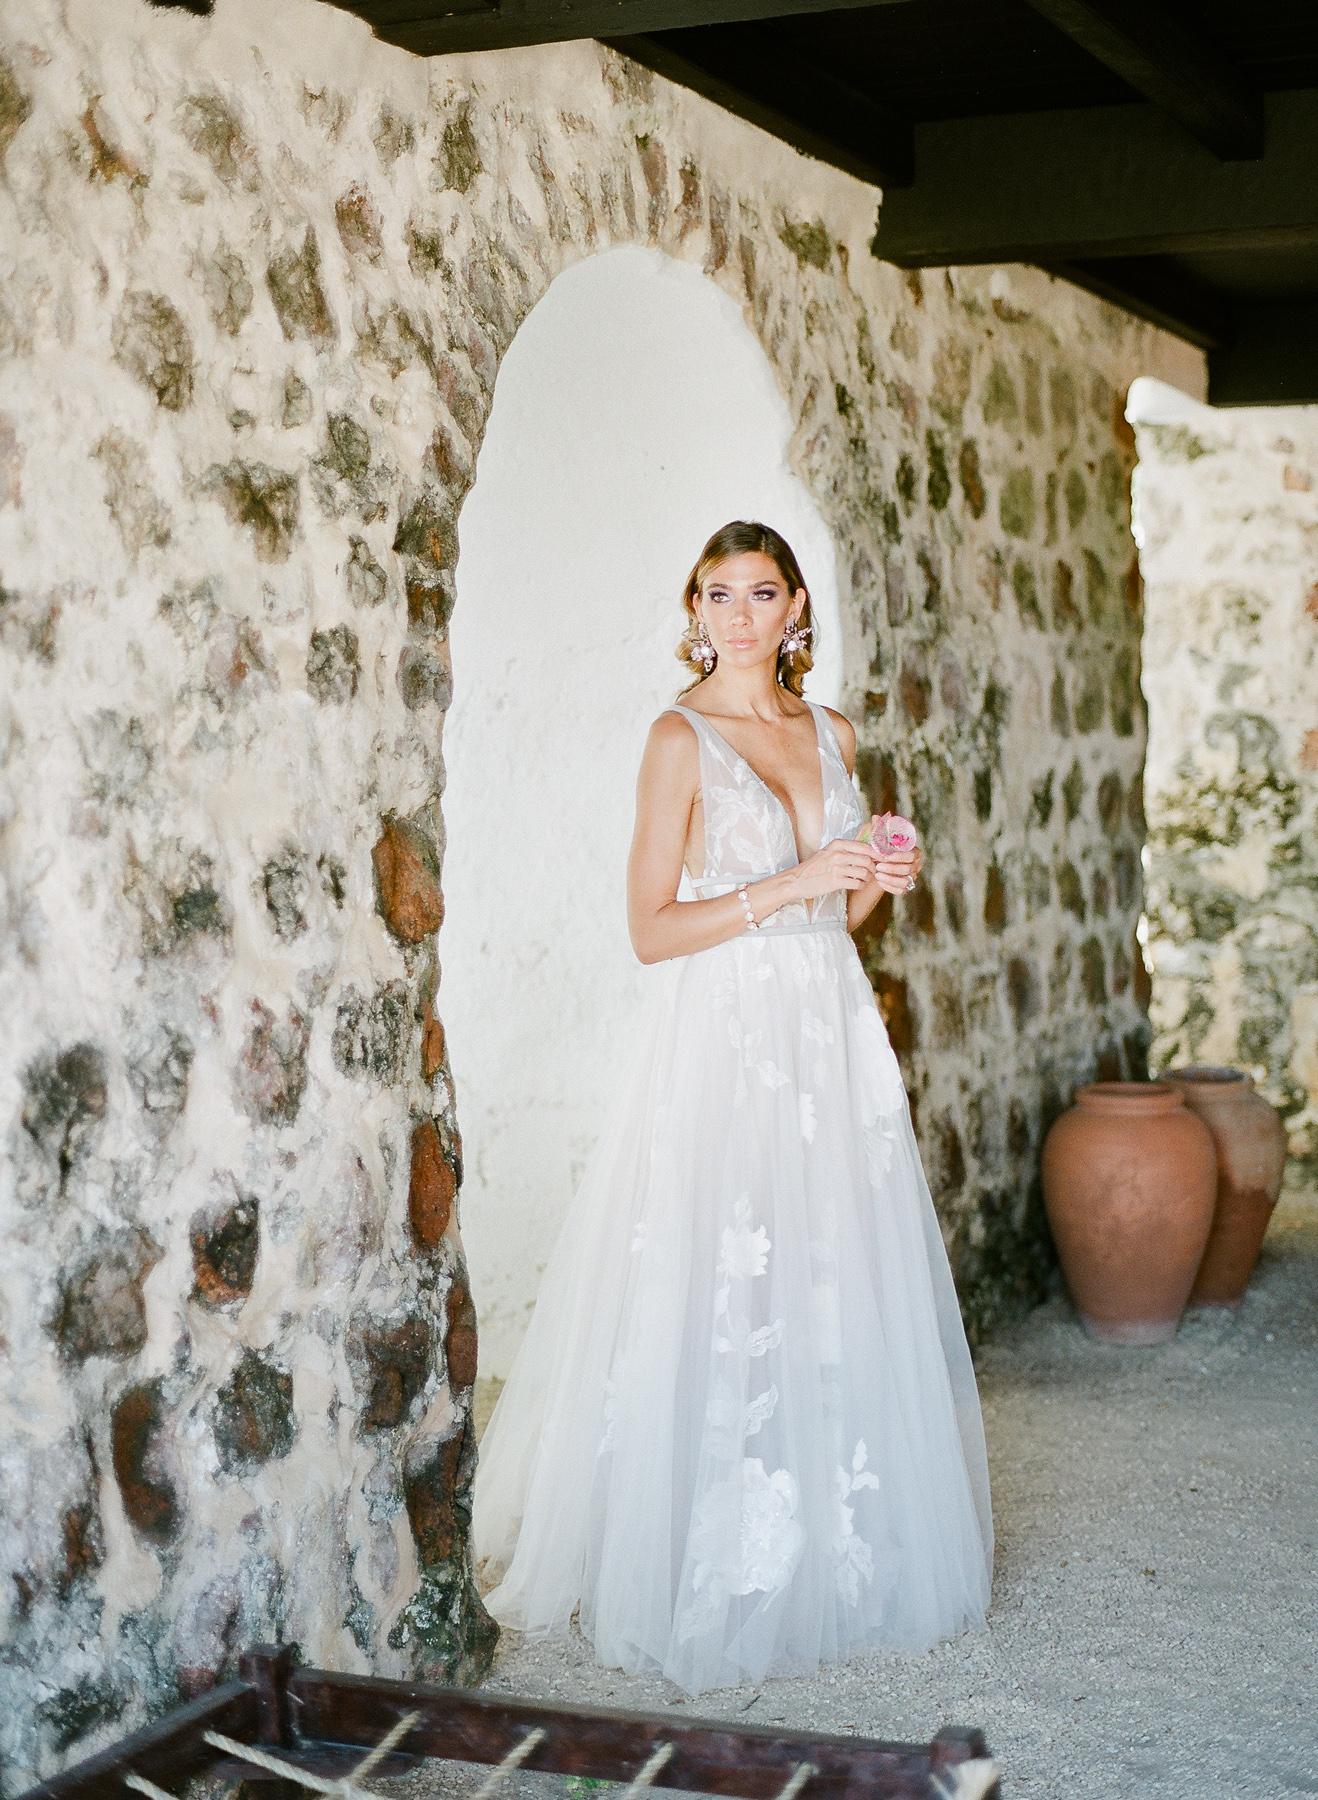 Grand-Cayman-Wedding-004.jpg